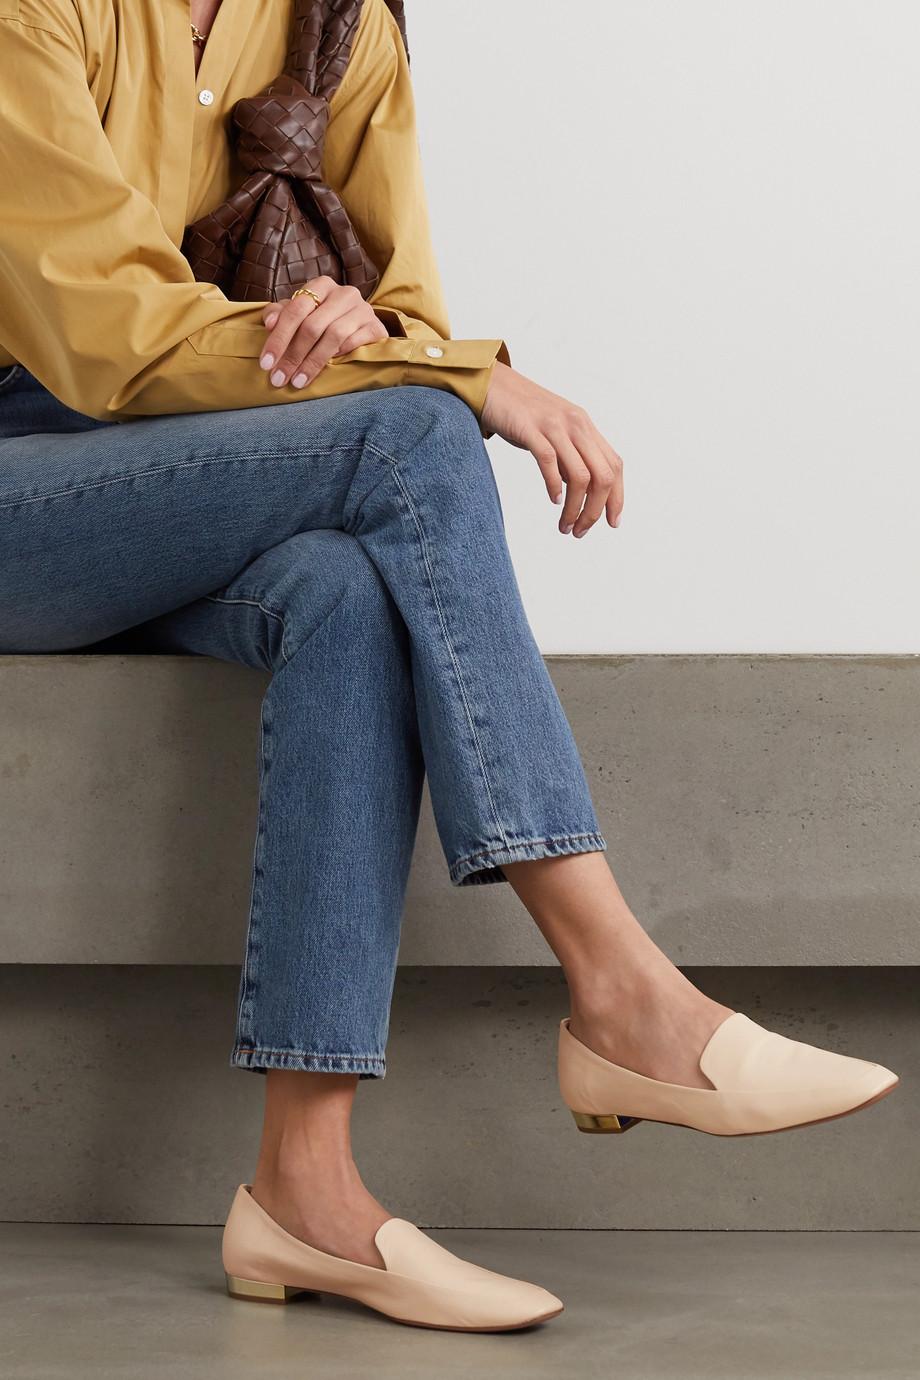 Aquazzura Greenwich 10 leather loafers